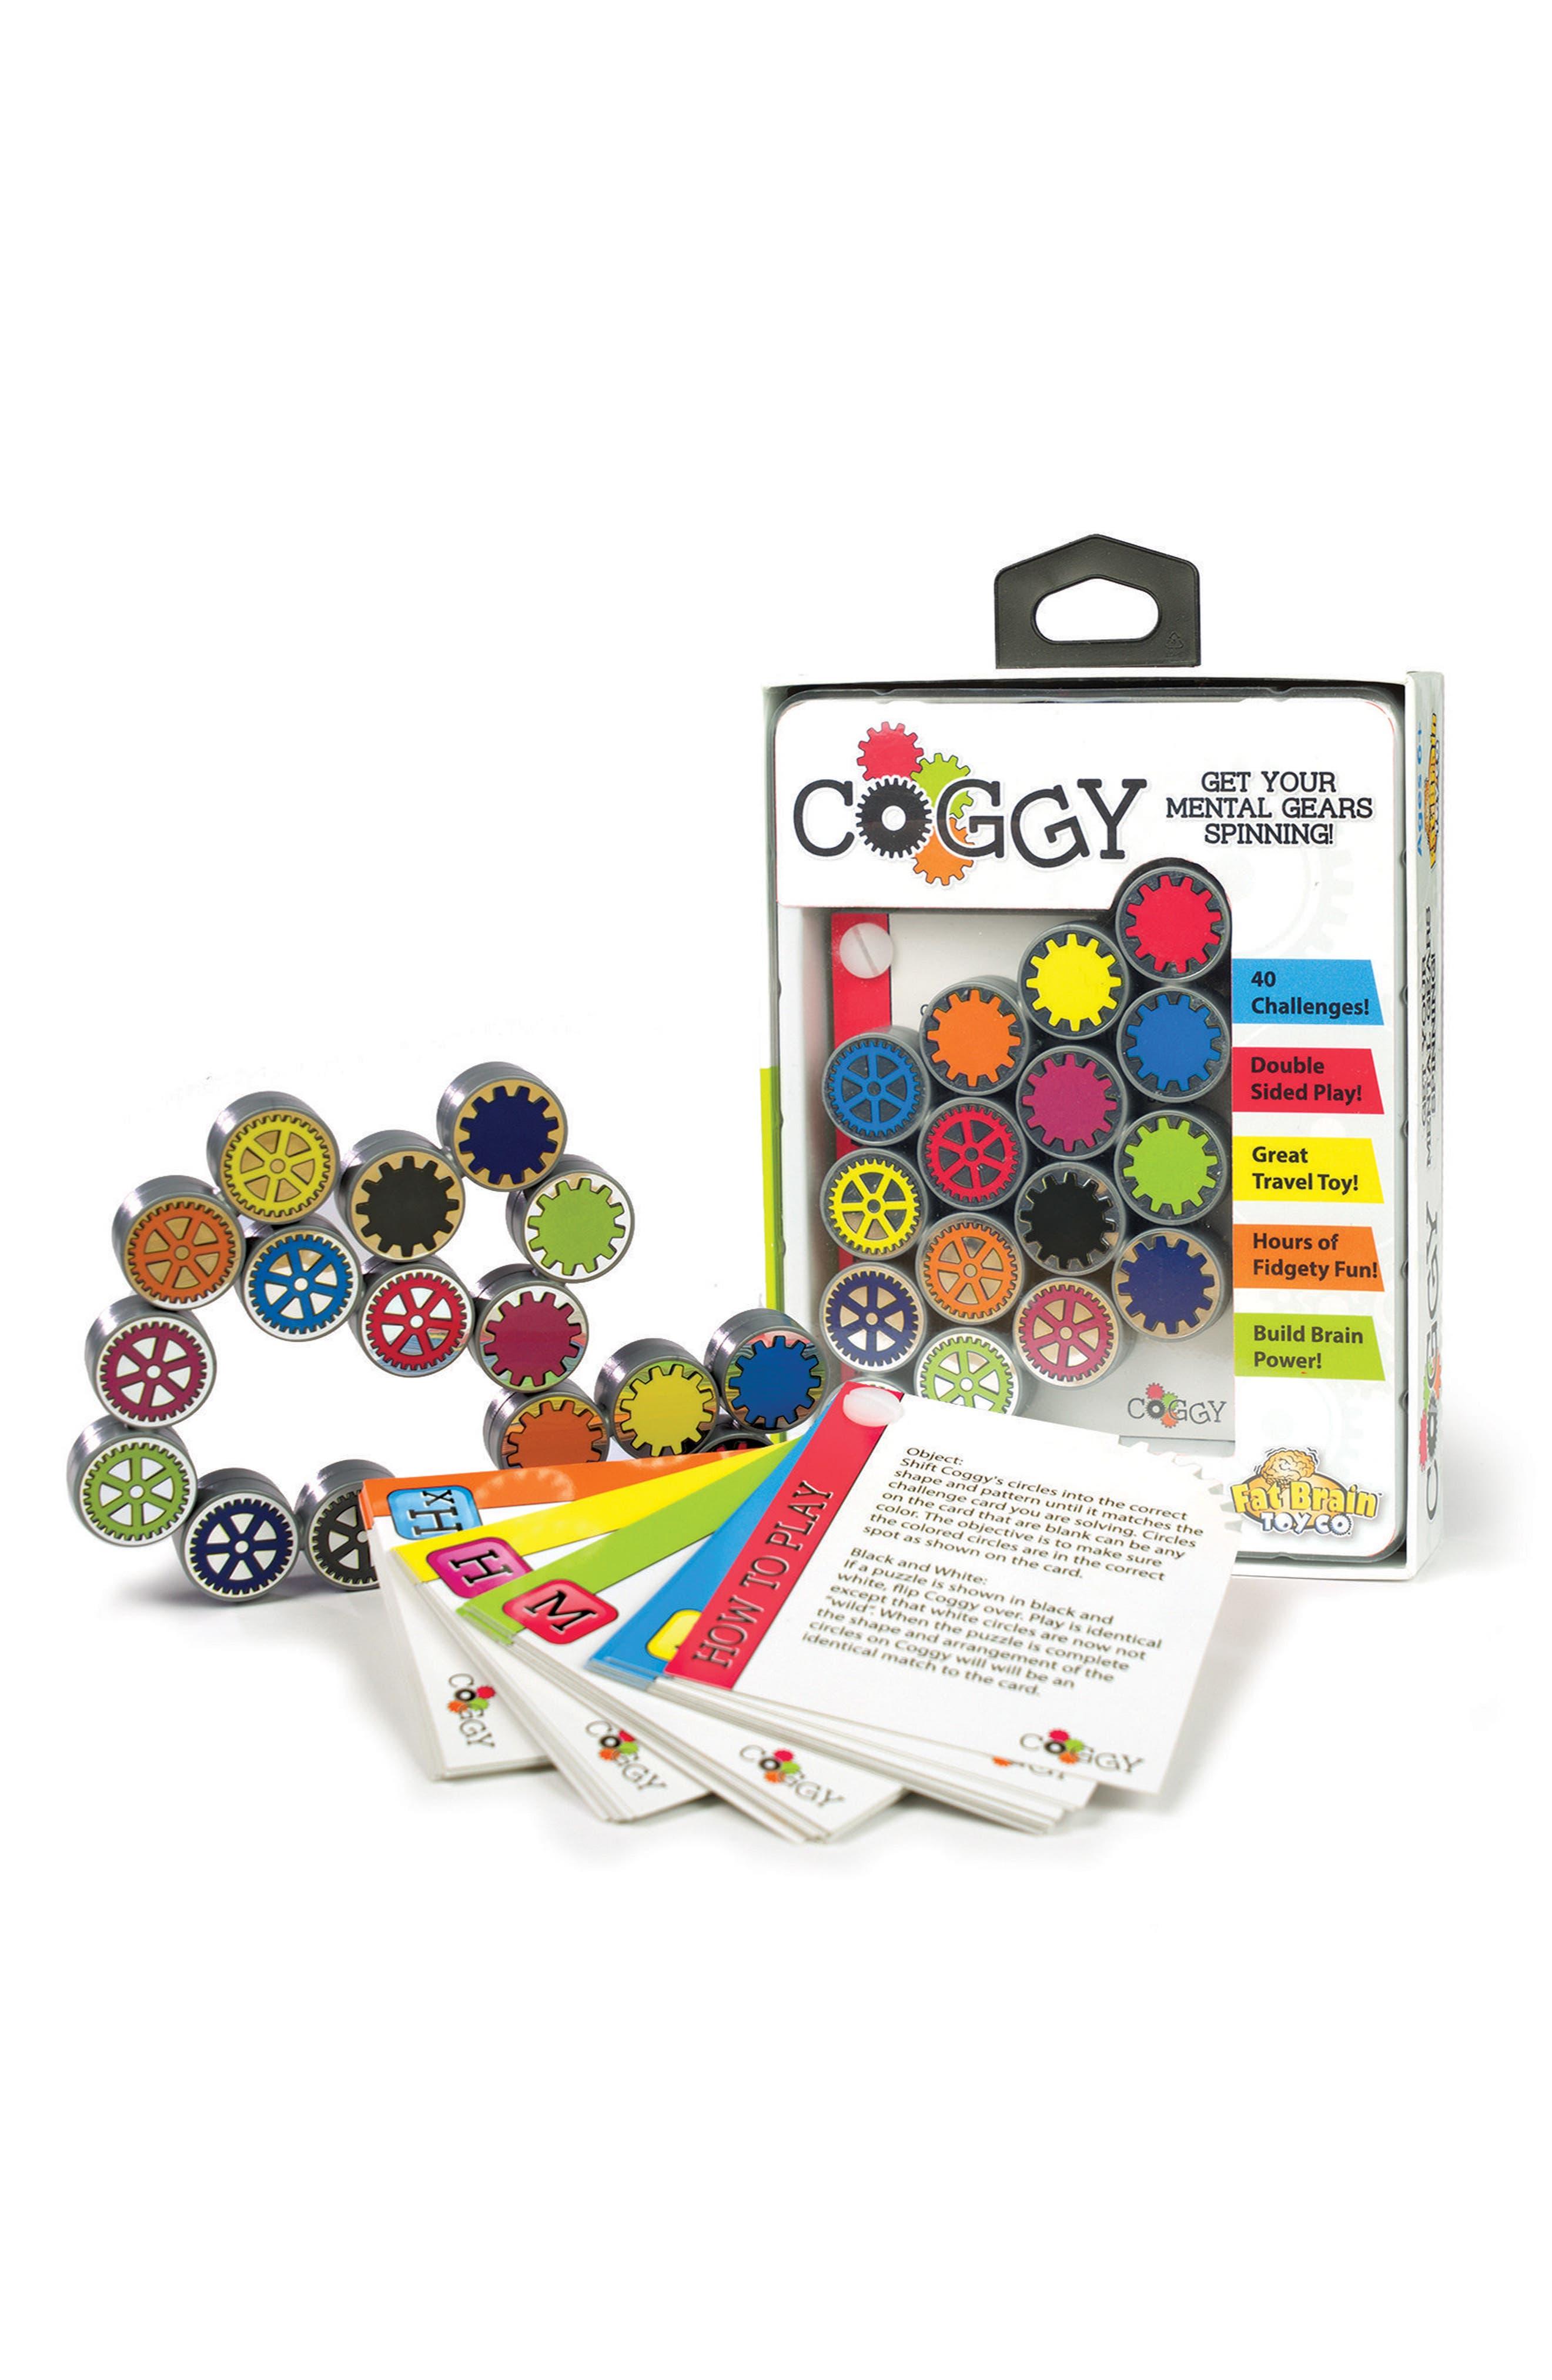 Main Image - Fat Brain Toys Coggy Brain Teaser Toy